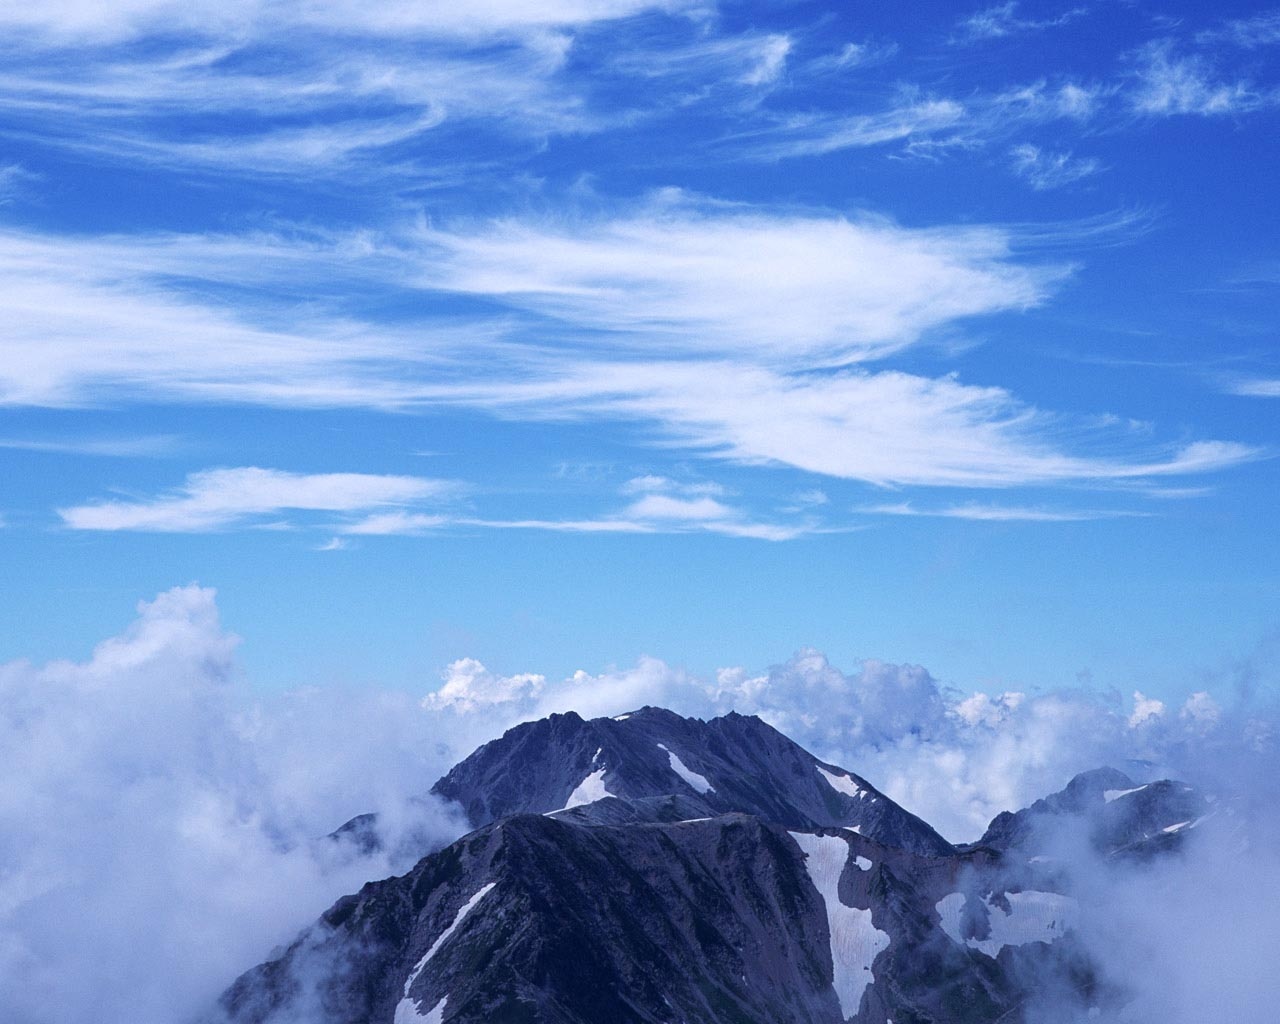 Sky And Cloud Free Hd Wallpaper 543